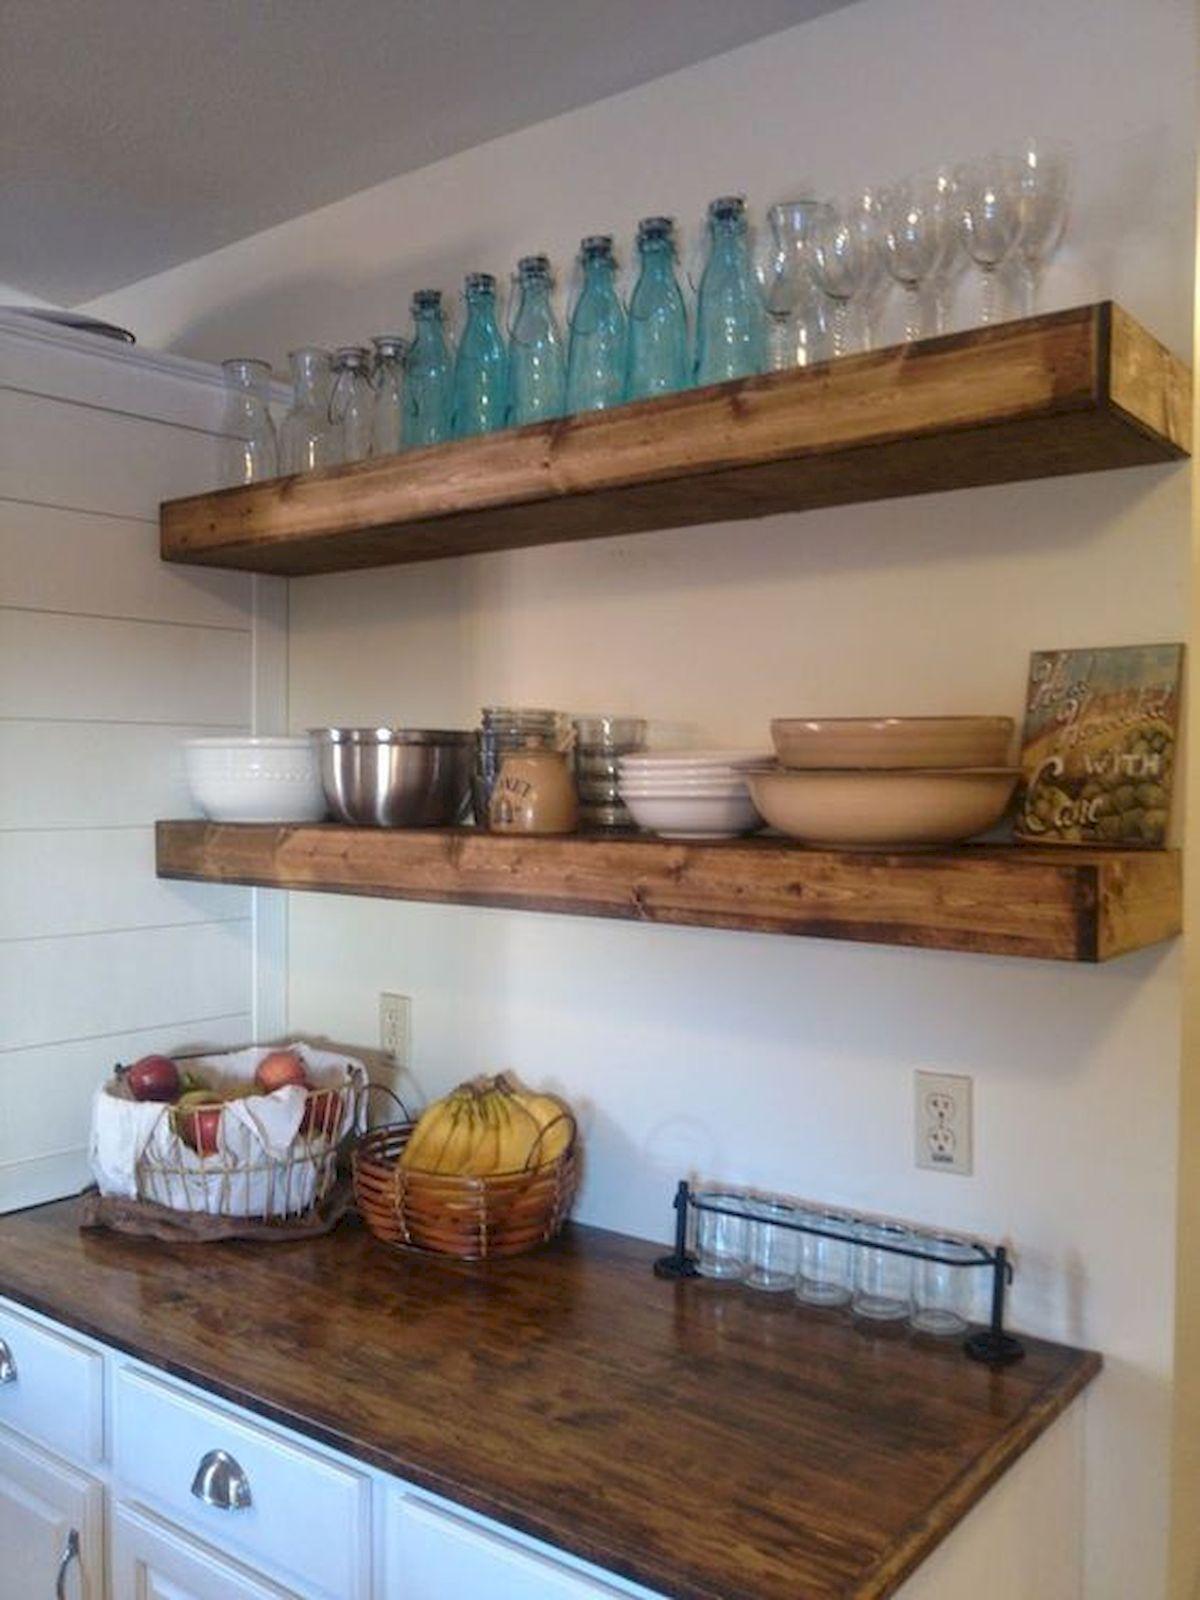 46 Easy DIY Kitchen Storage Ideas for Small Kitchen (6)